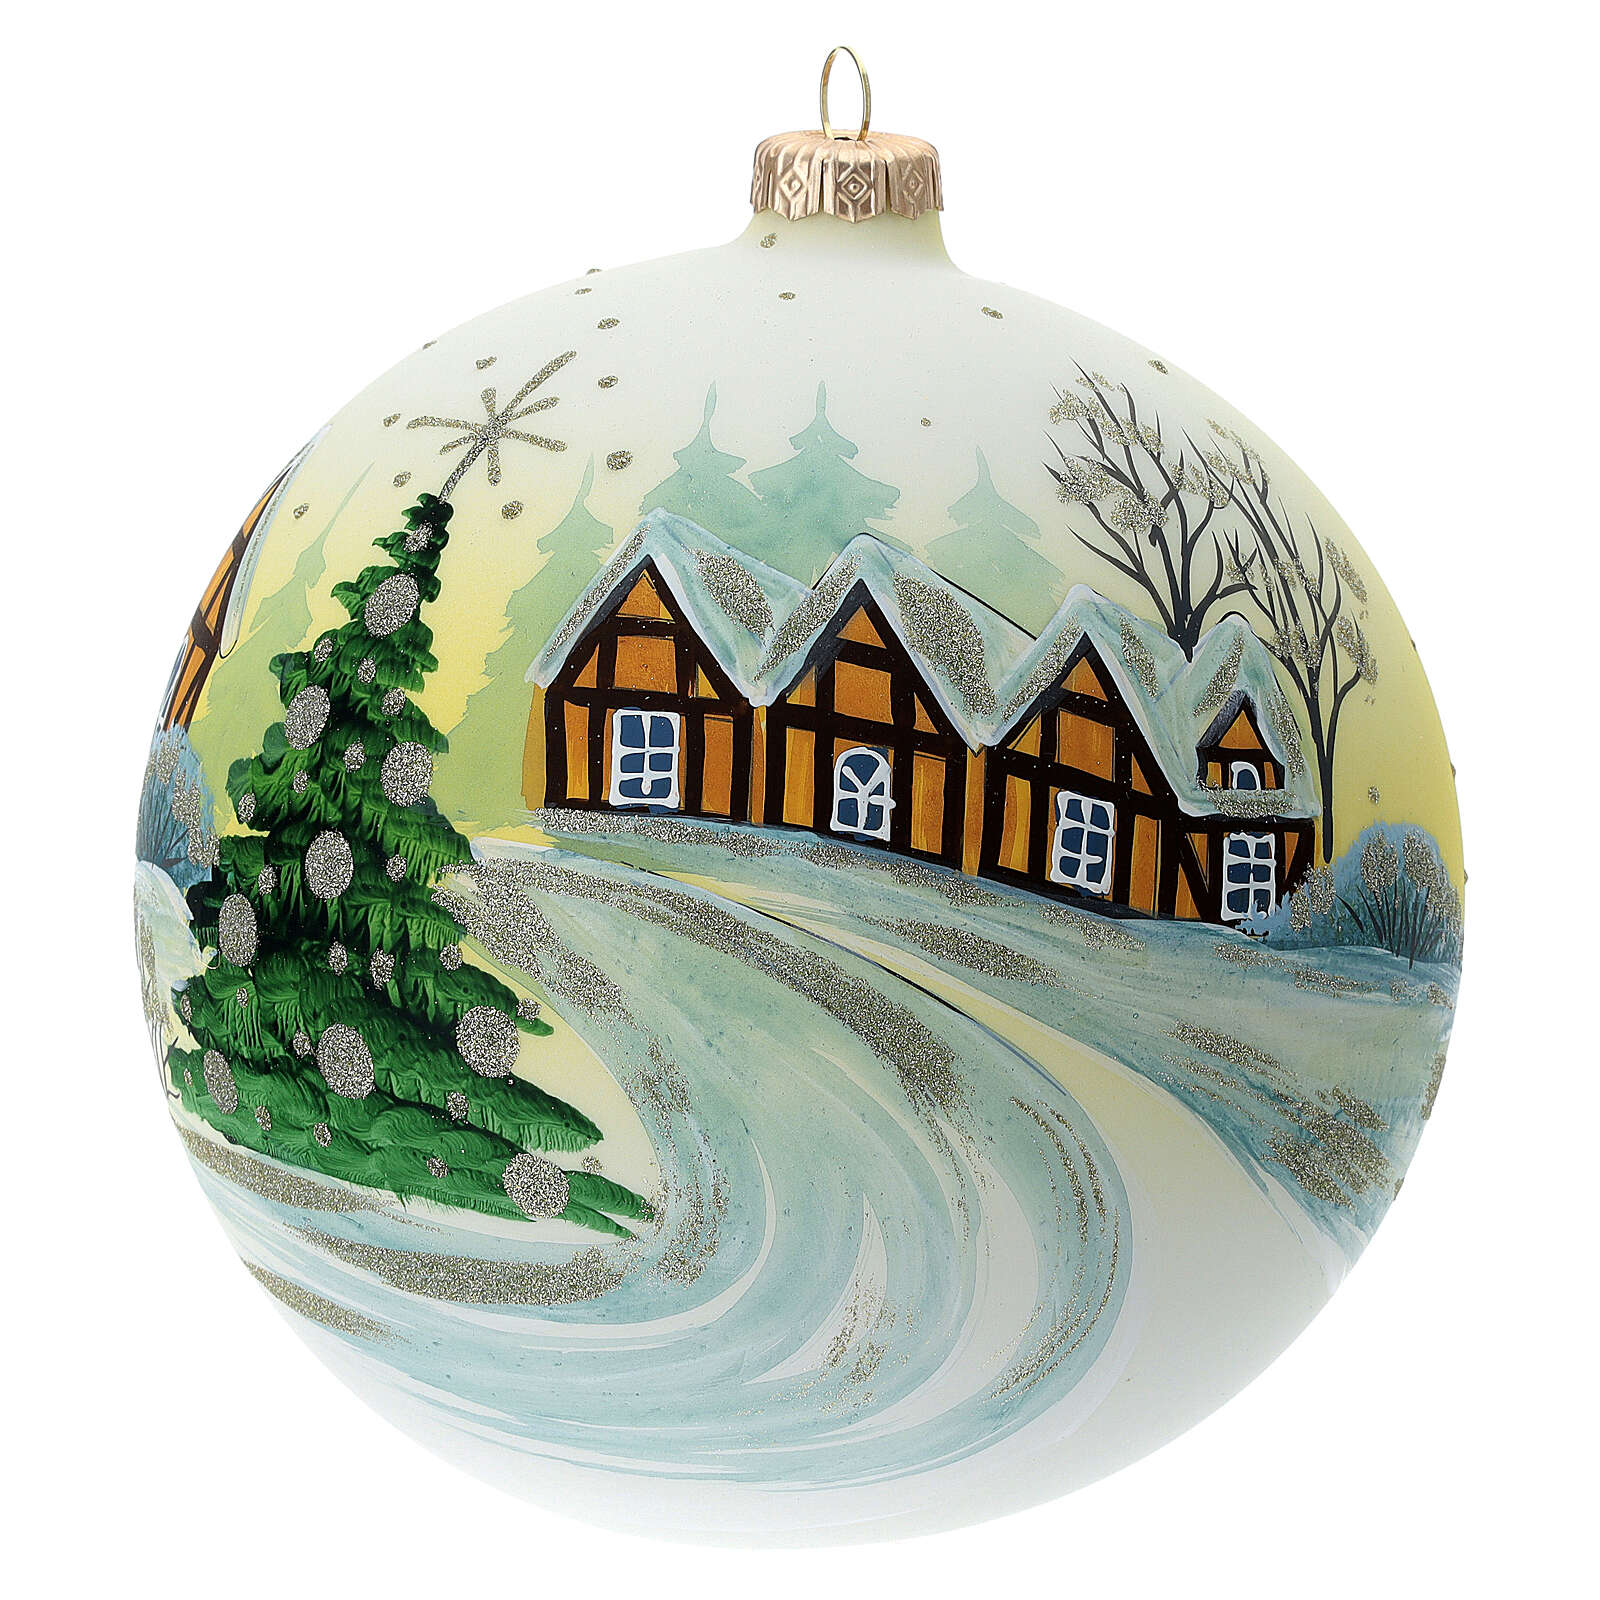 Bola árvore de Natal Pai Natal aldeia nevada céu amarelo vidro soprado 150 mm 4